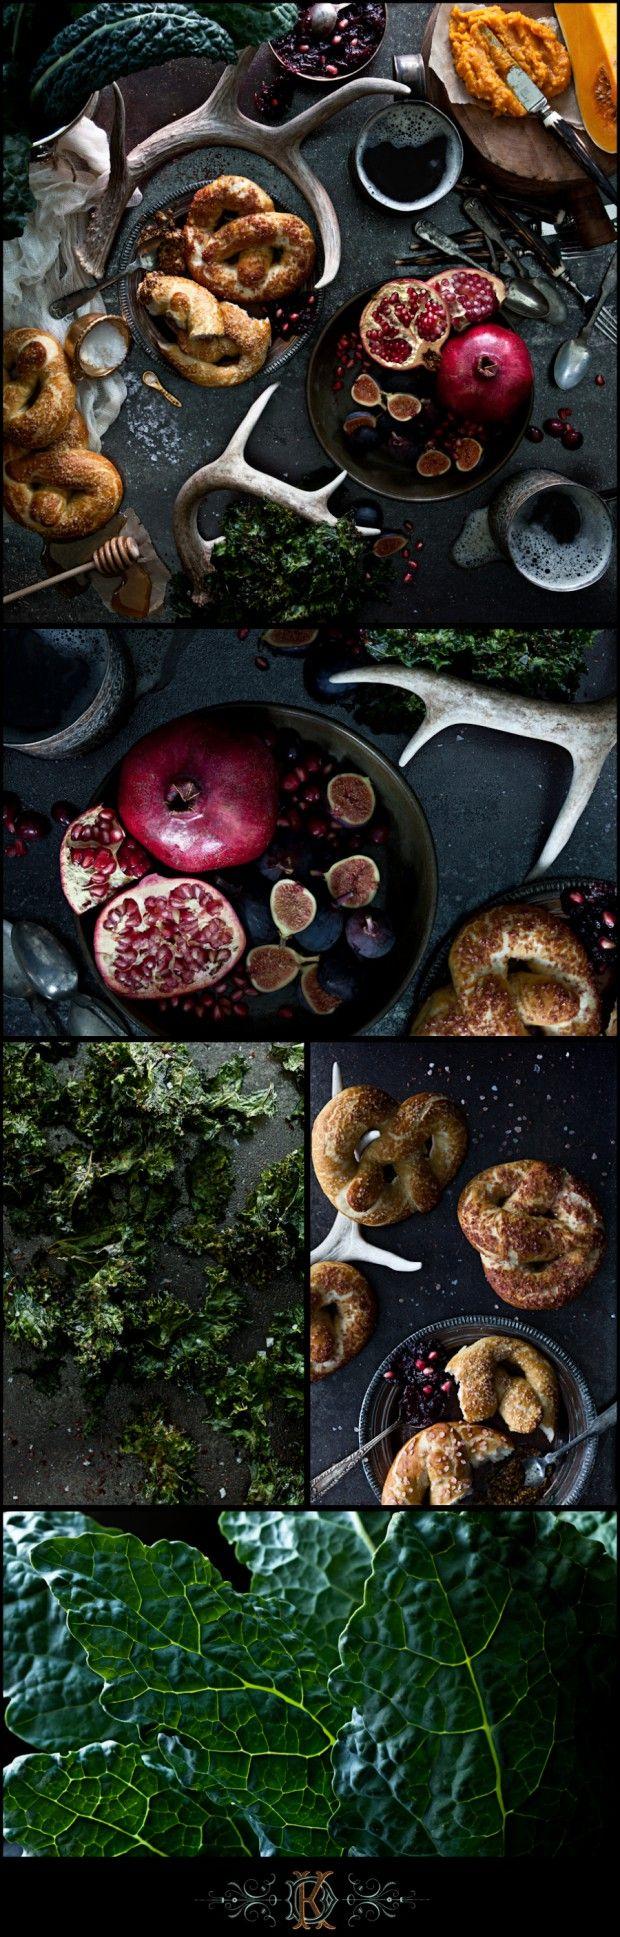 My Fall Still Life food styling work with photog Kimberly Davis